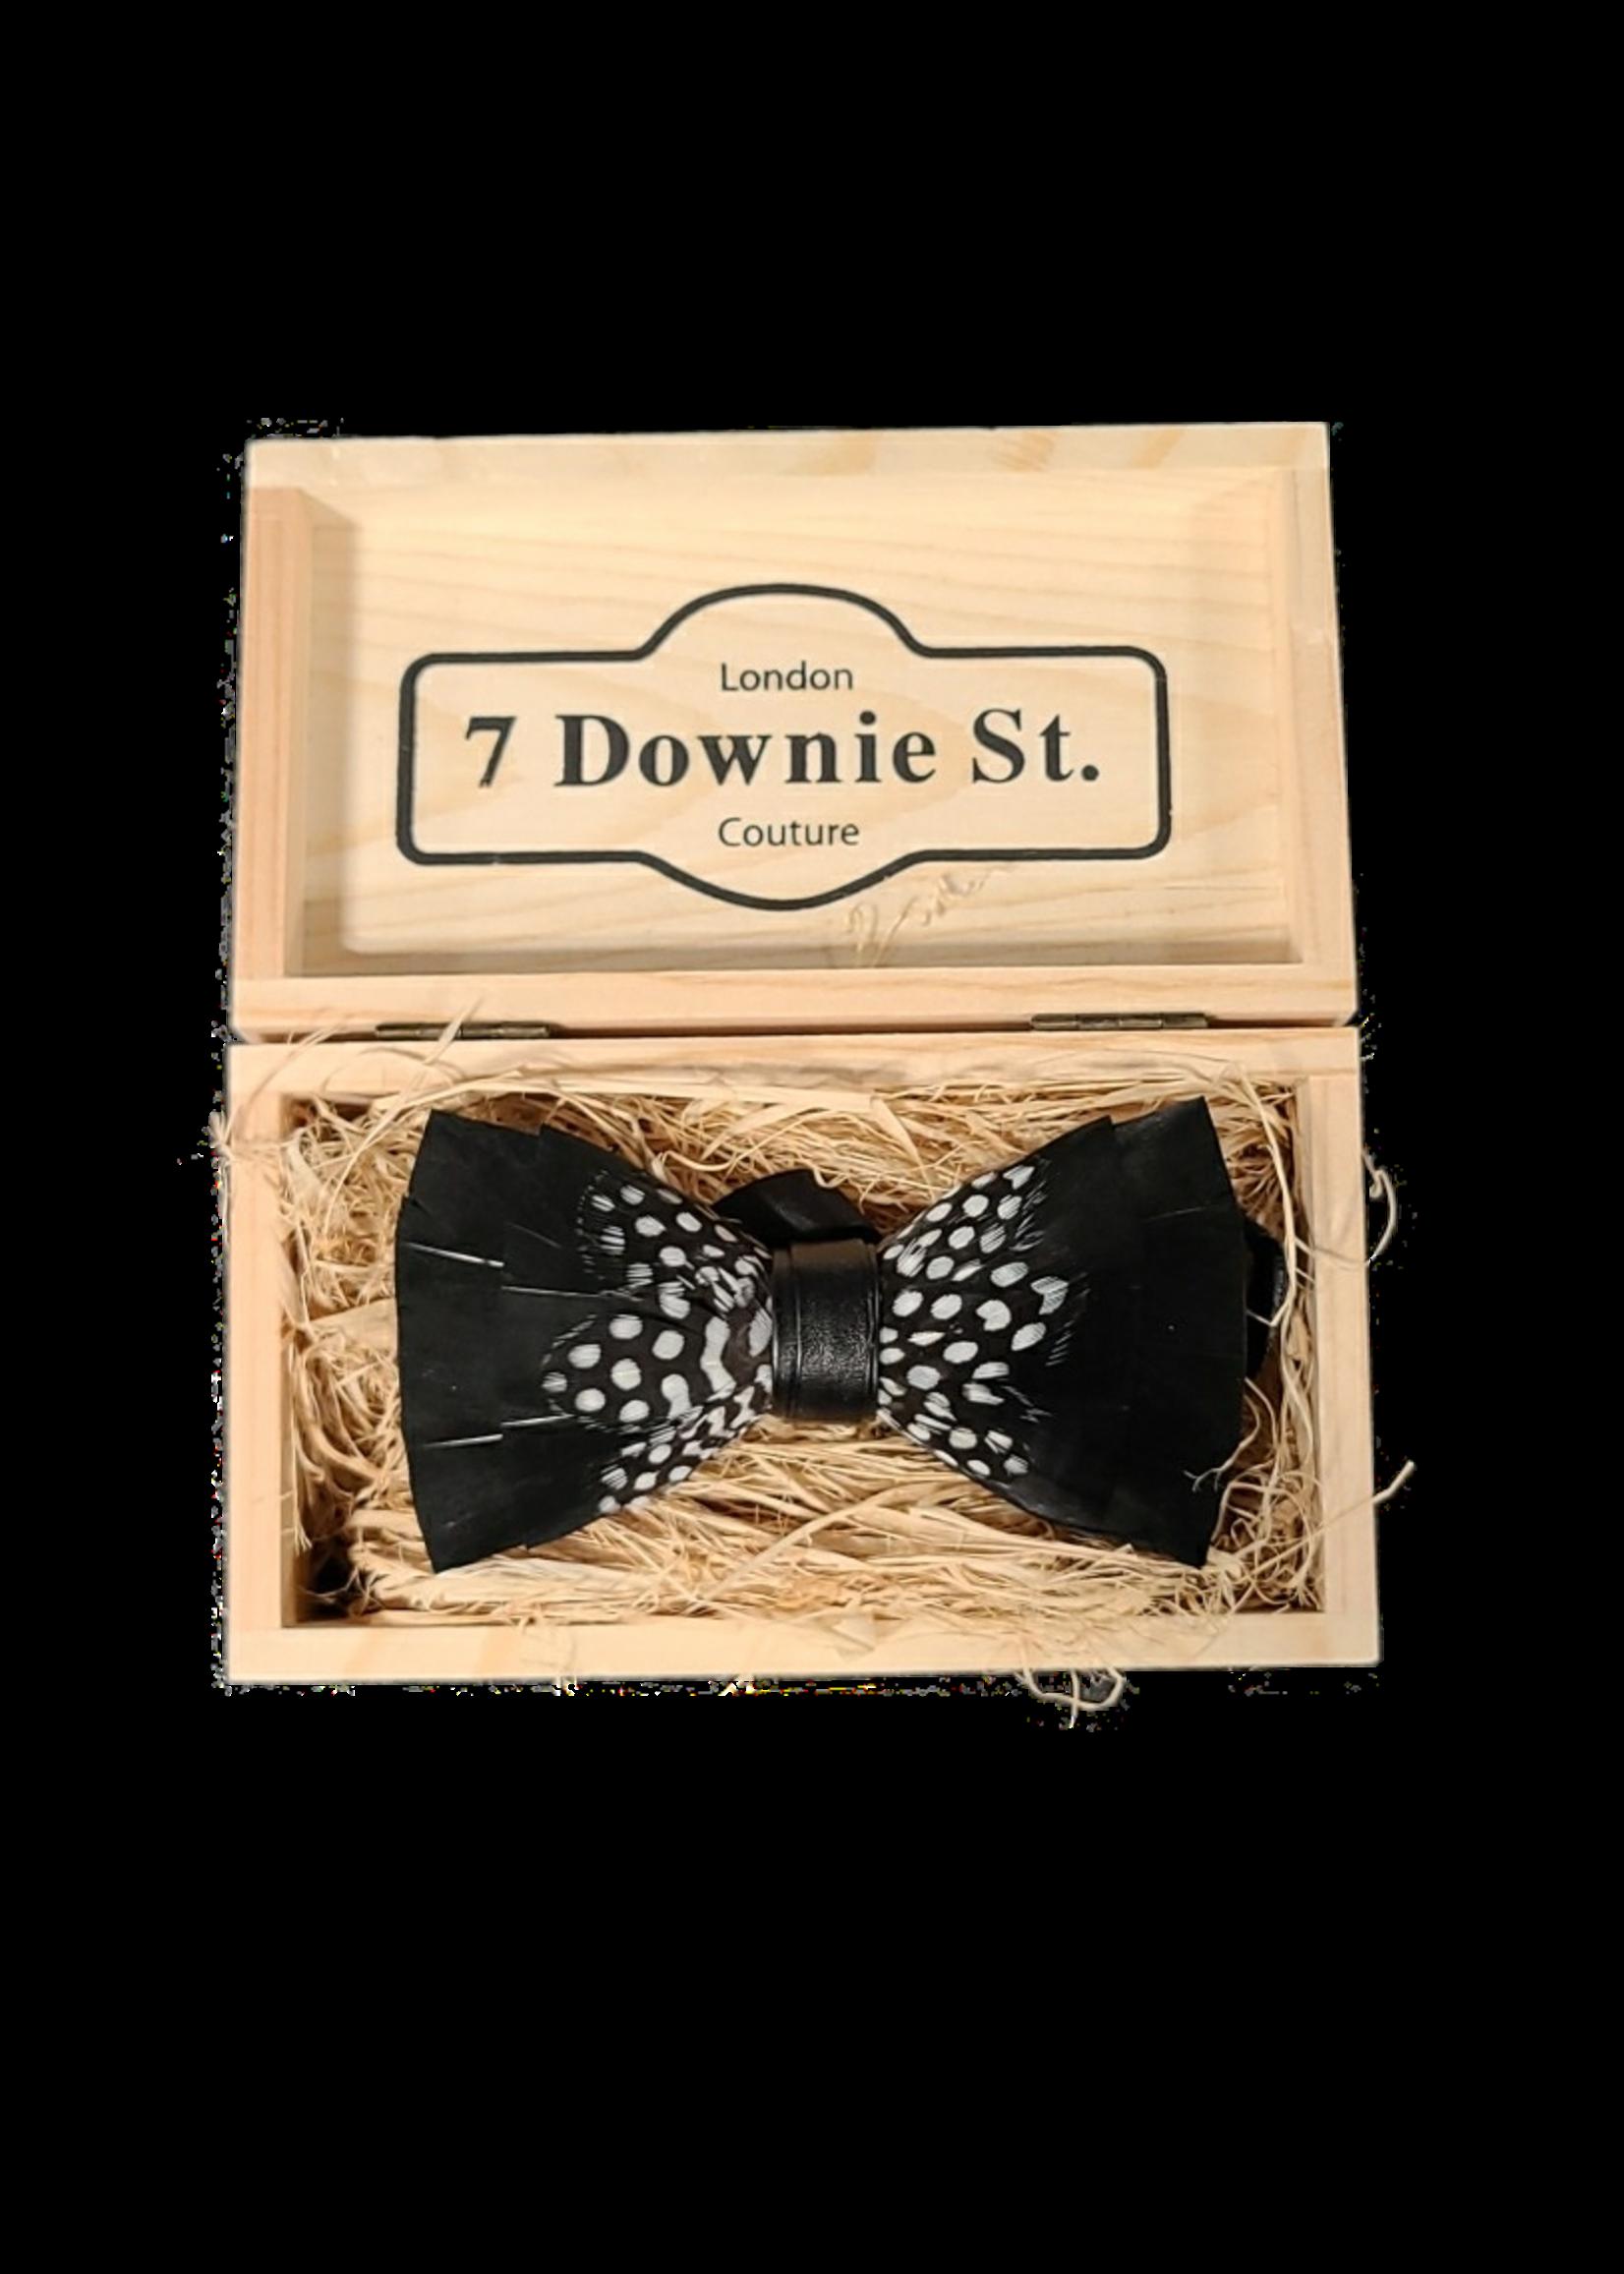 7 Downie St. 7 Downie St. Feather Bow Tie Black / Mid Dots